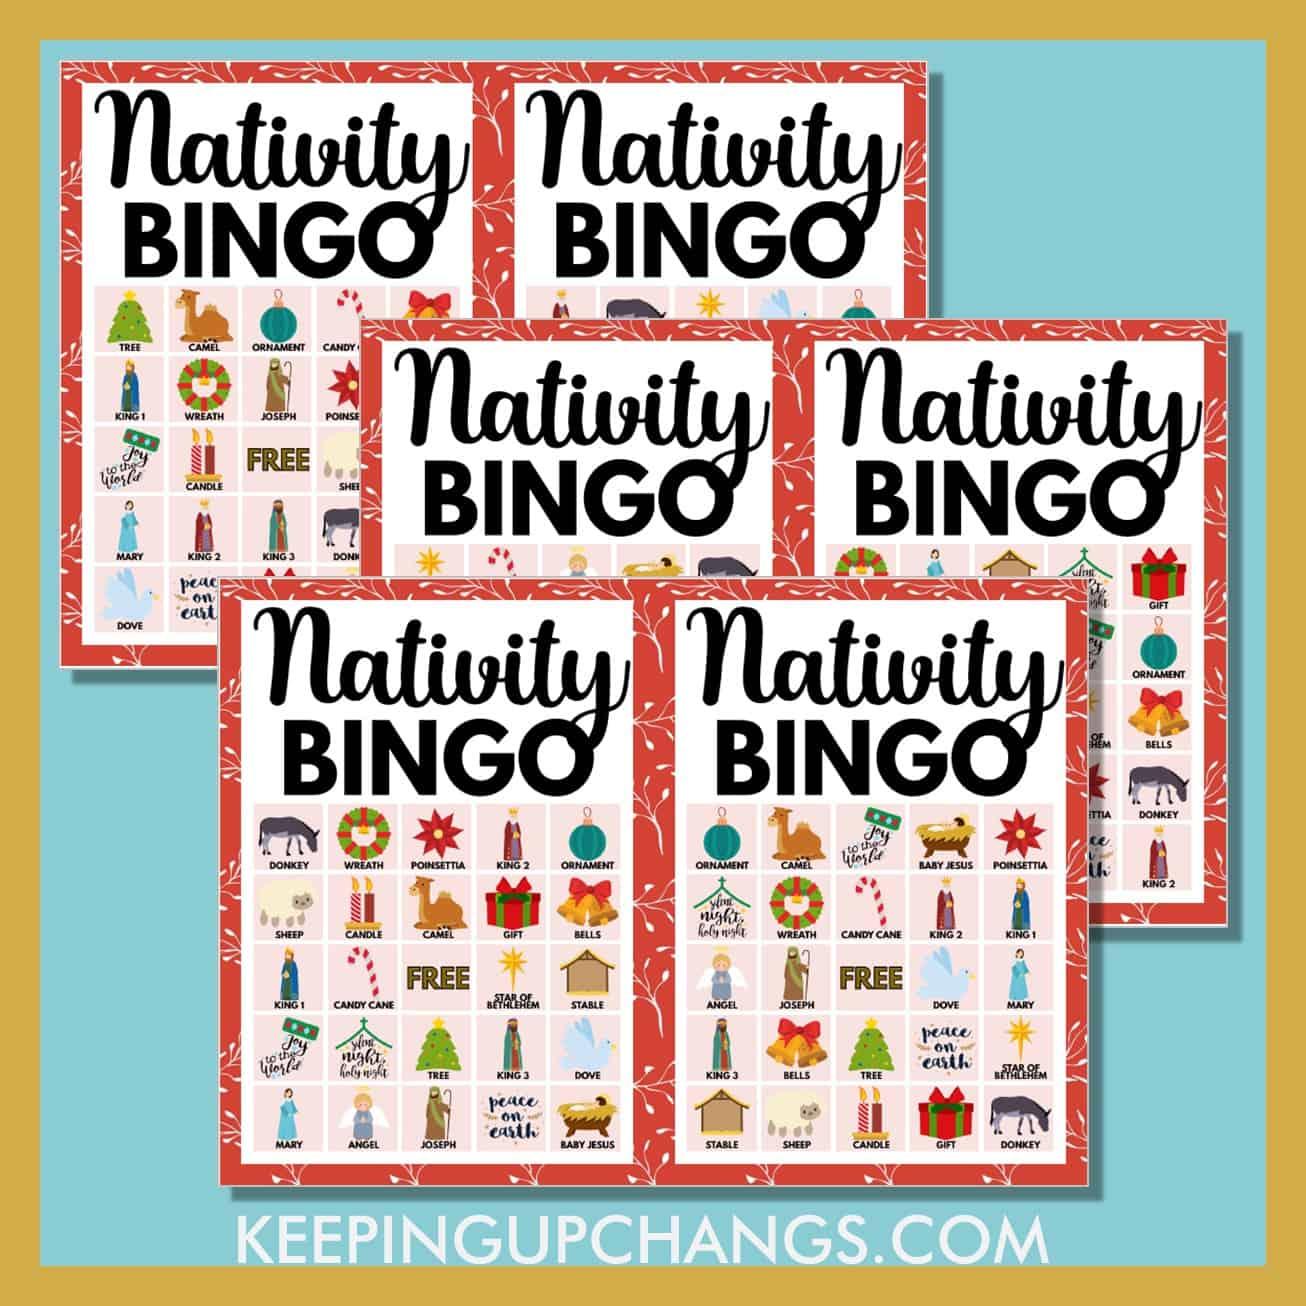 free nativity bible christmas bingo 5x5 game cards.